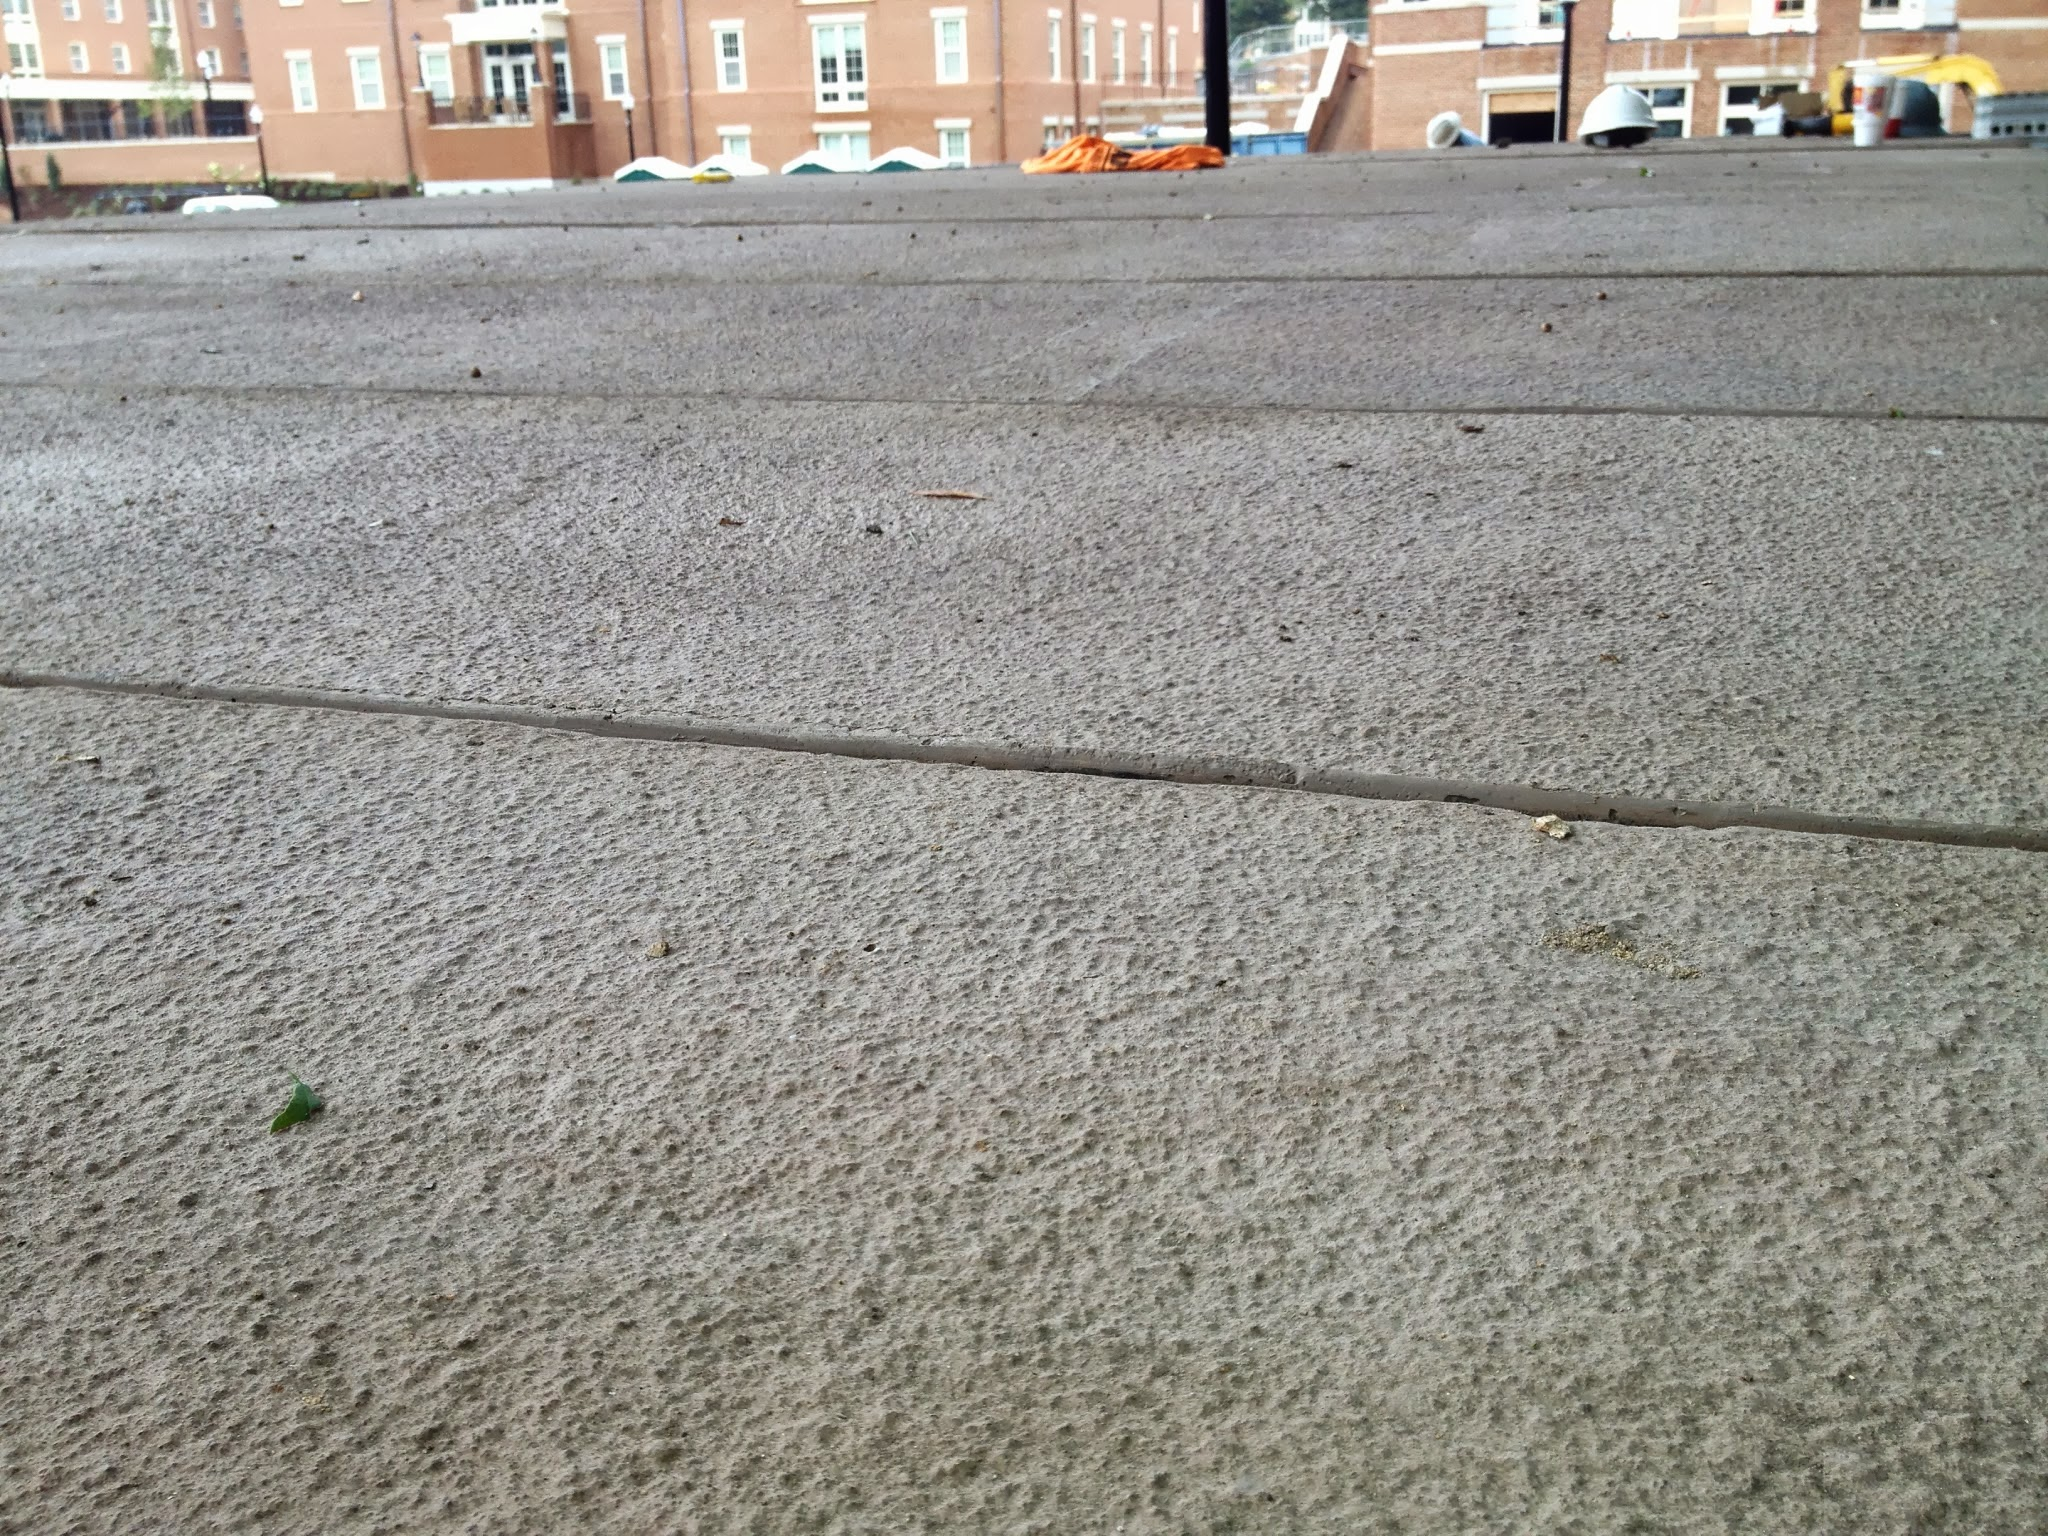 Savannah Brown Concrete with Sandblast Texture - 3.jpg